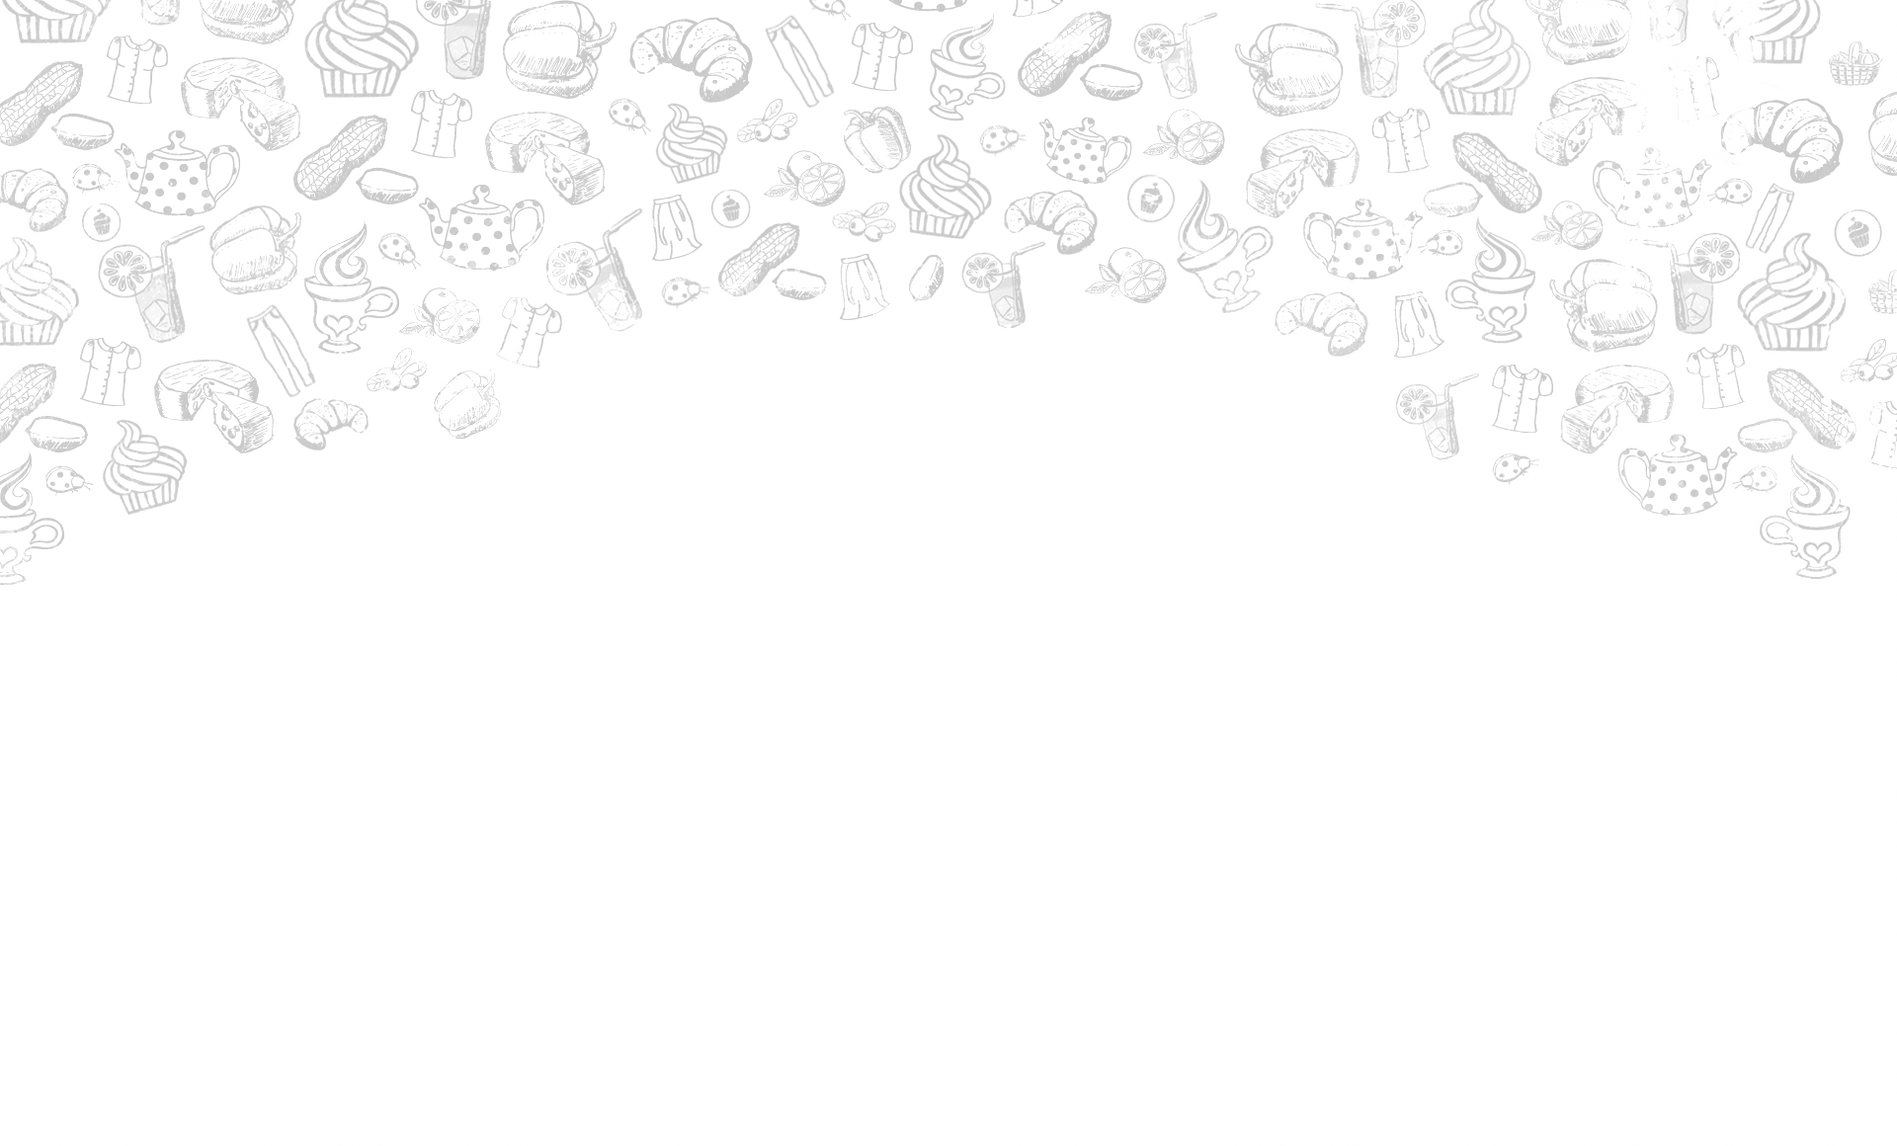 Doodles_edited_edited_edited.png